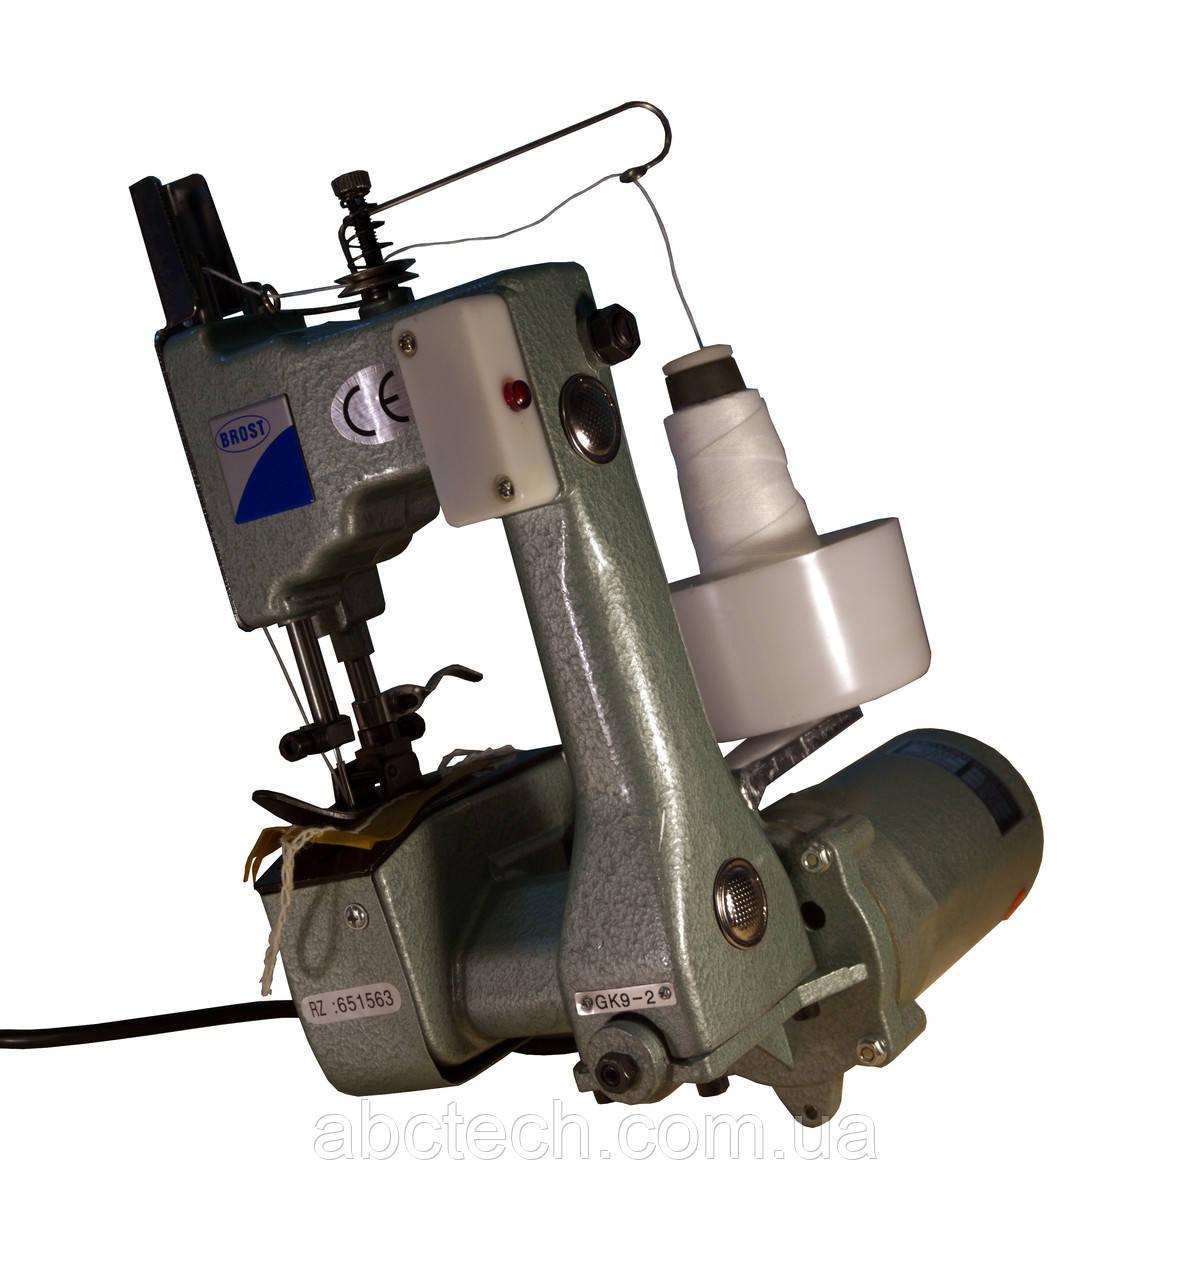 Мешкозашивочная машинка GK 9-2 300 мешков смена